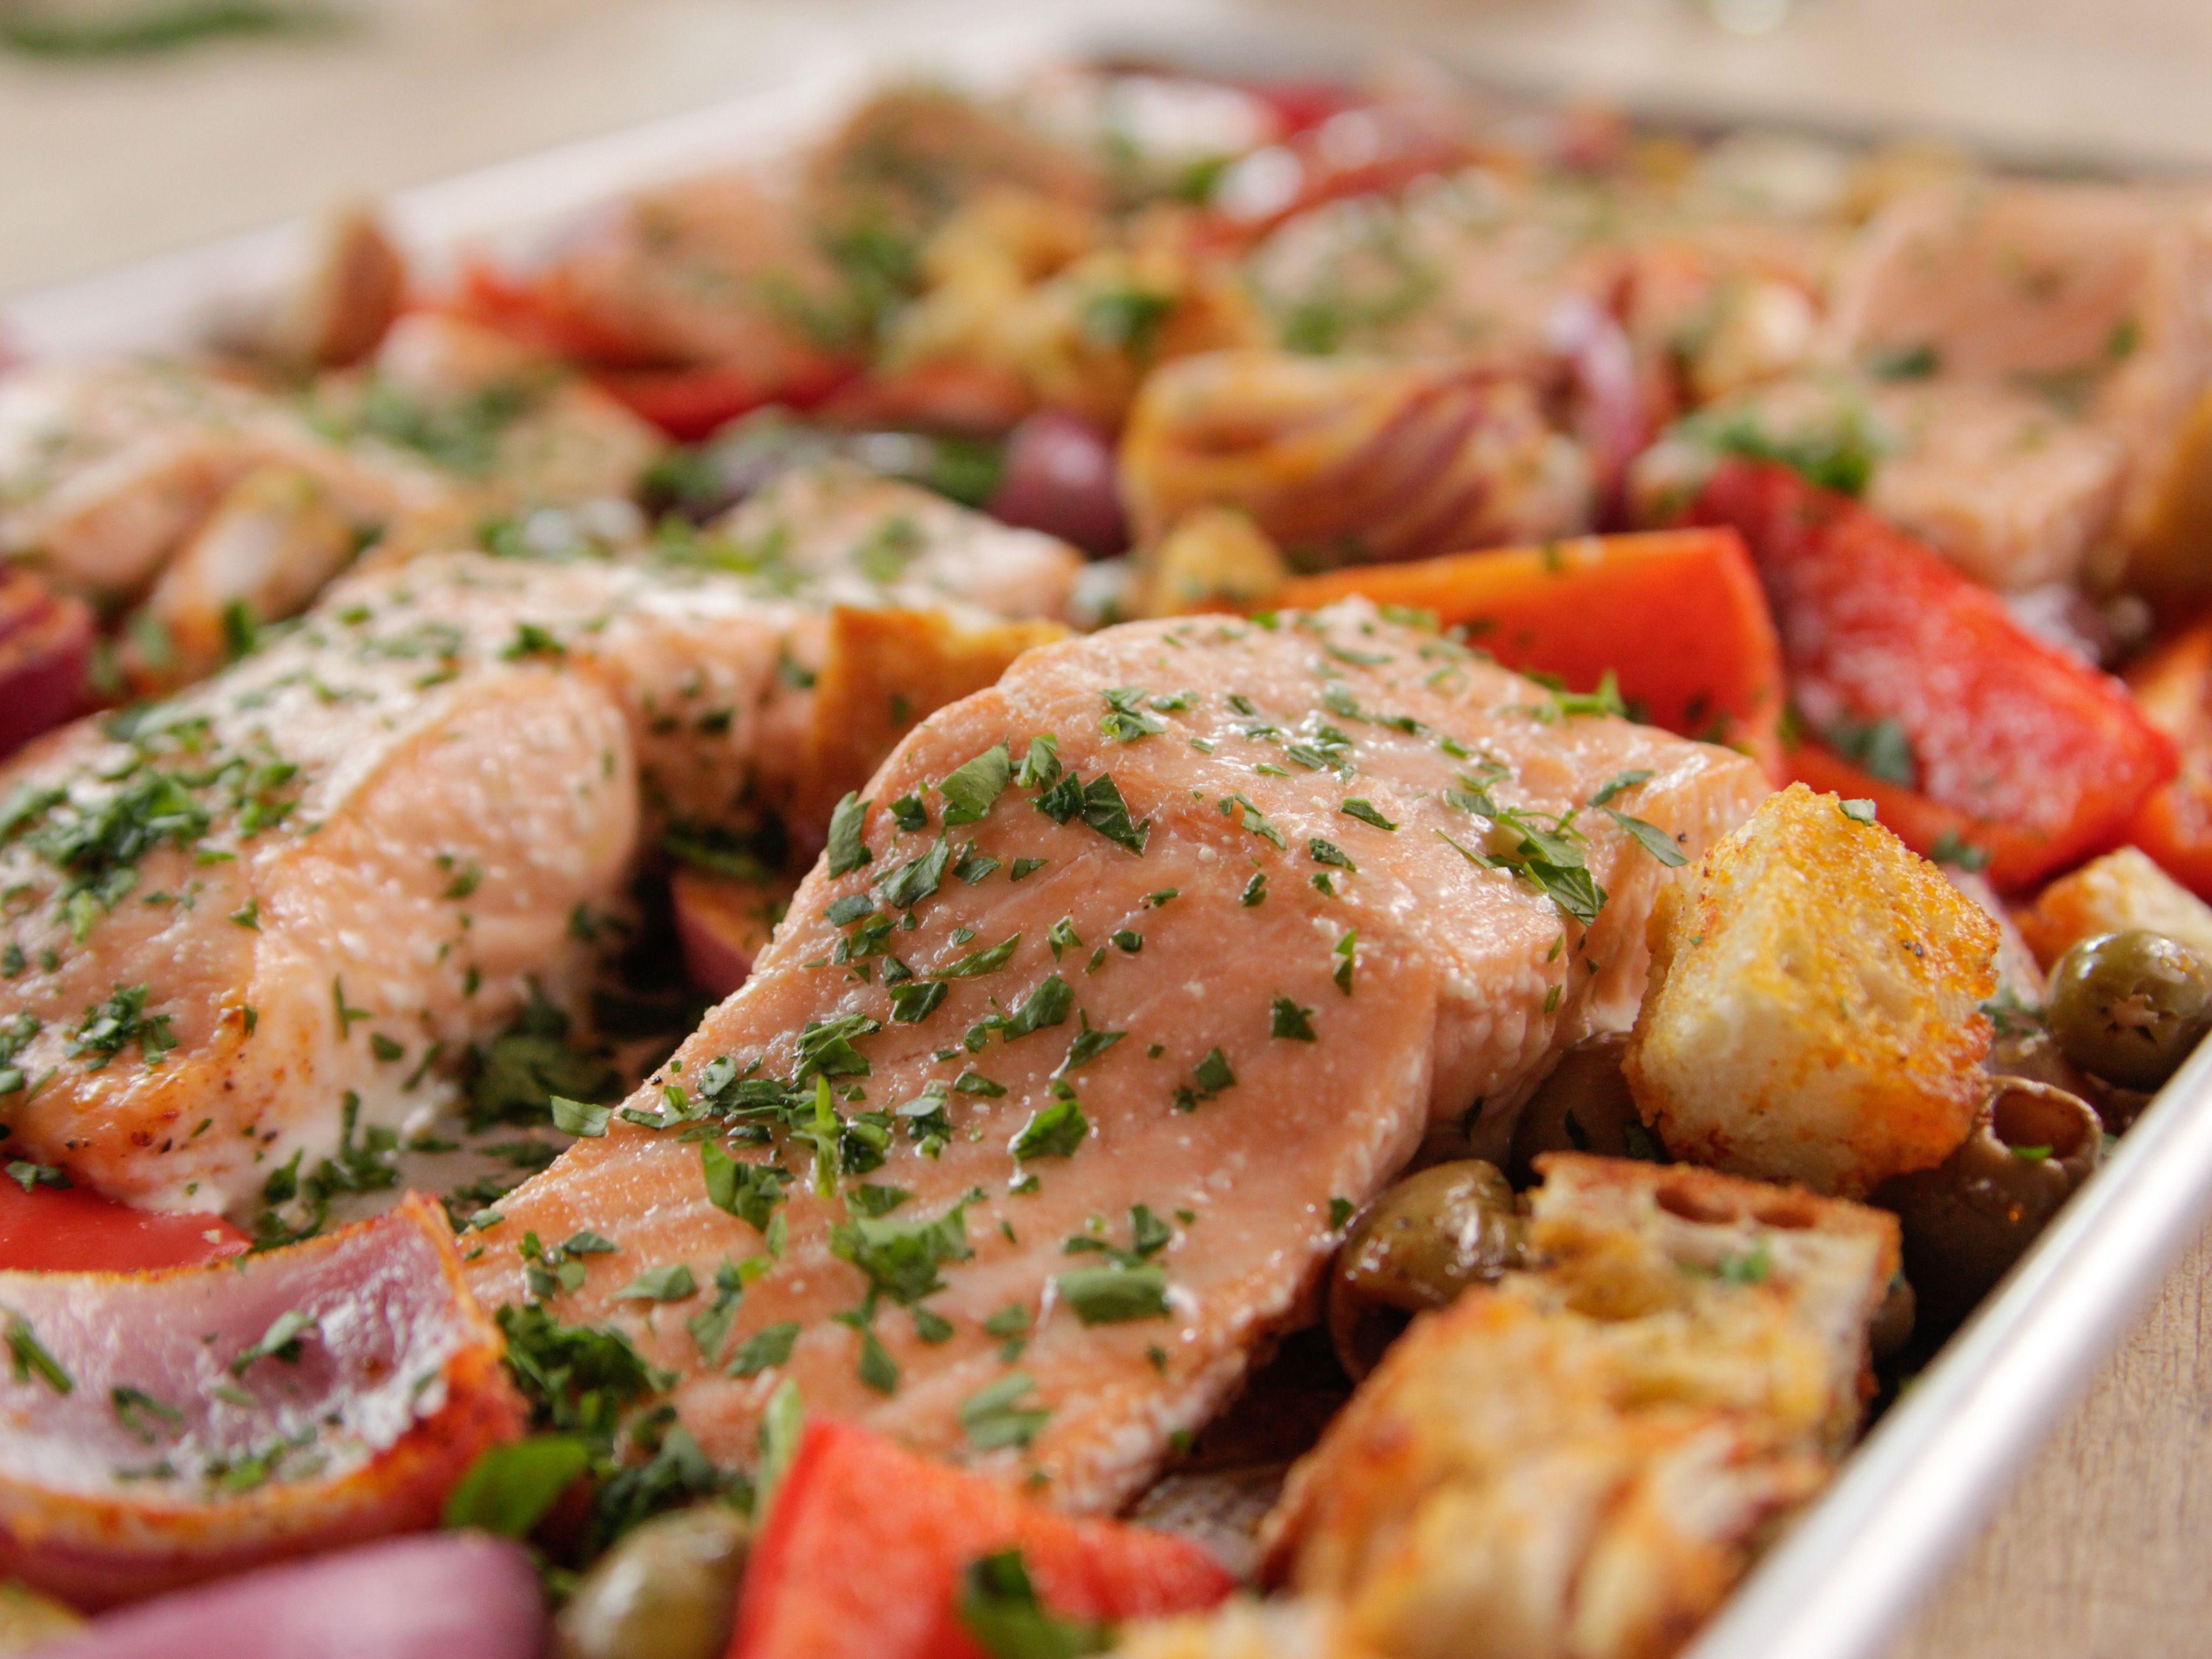 Spanish Baked Salmon